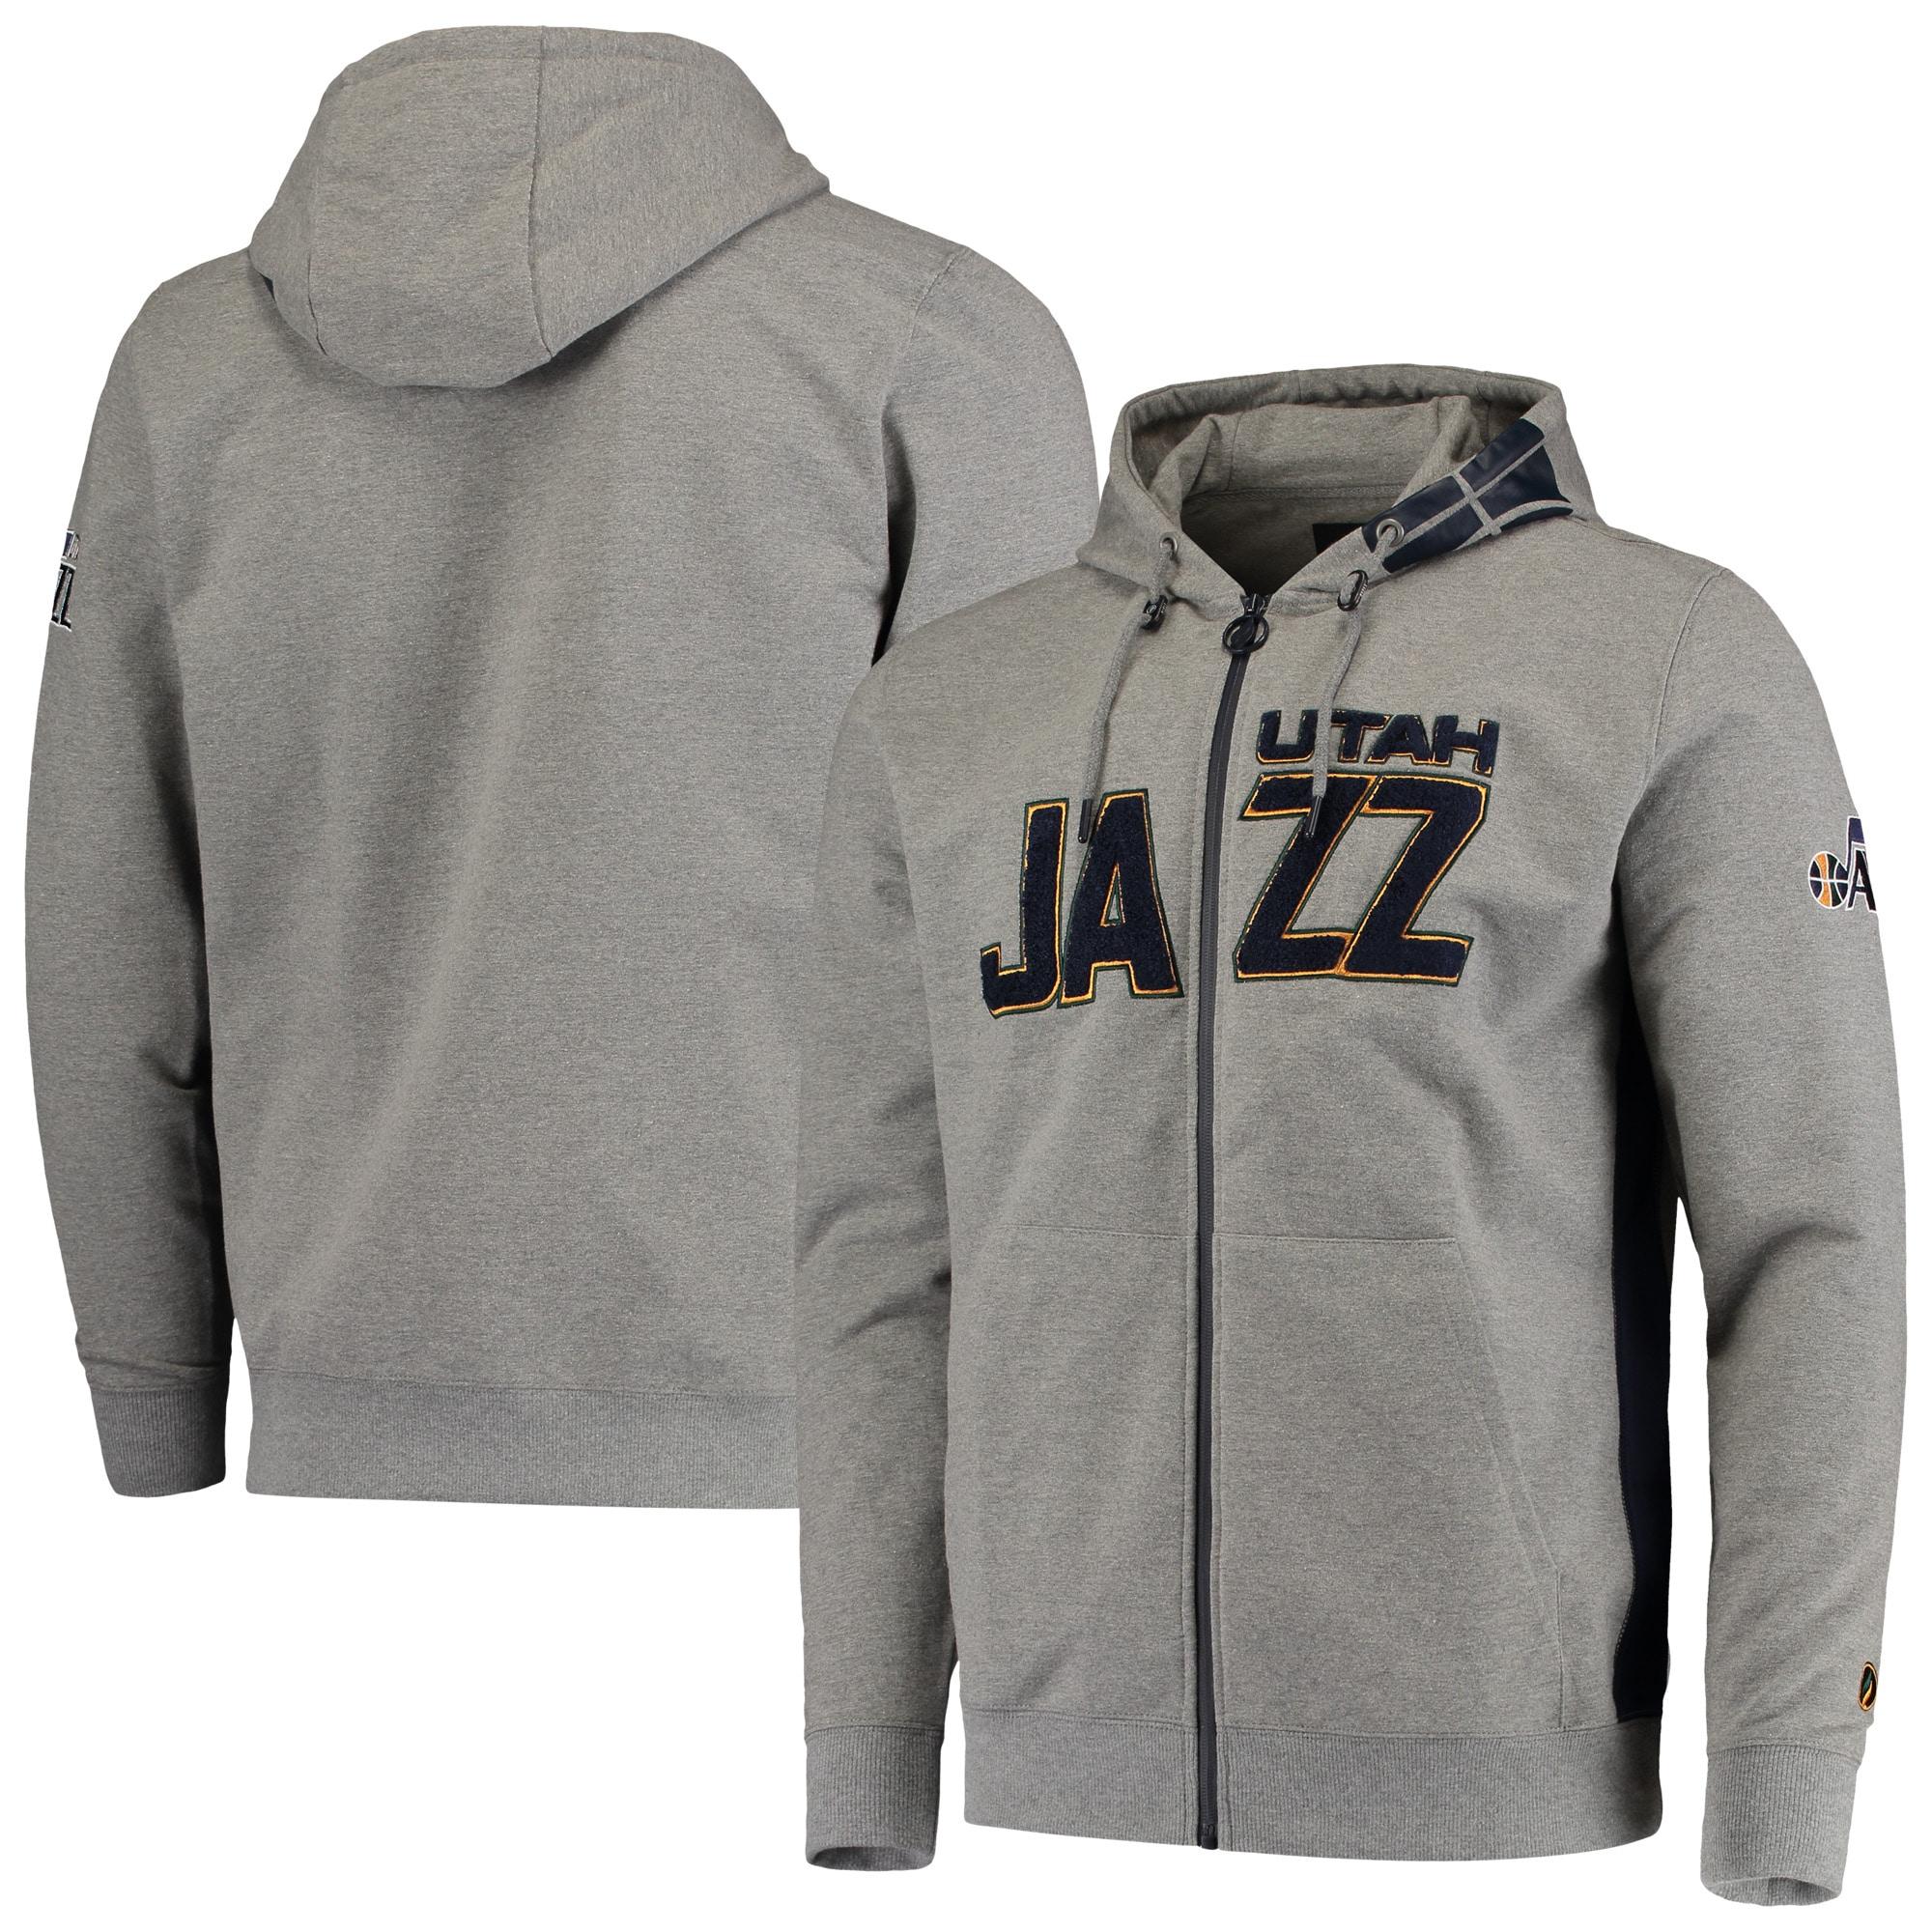 Utah Jazz Core Chenille French Terry Tri-Blend Full-Zip Hoodie - Gray